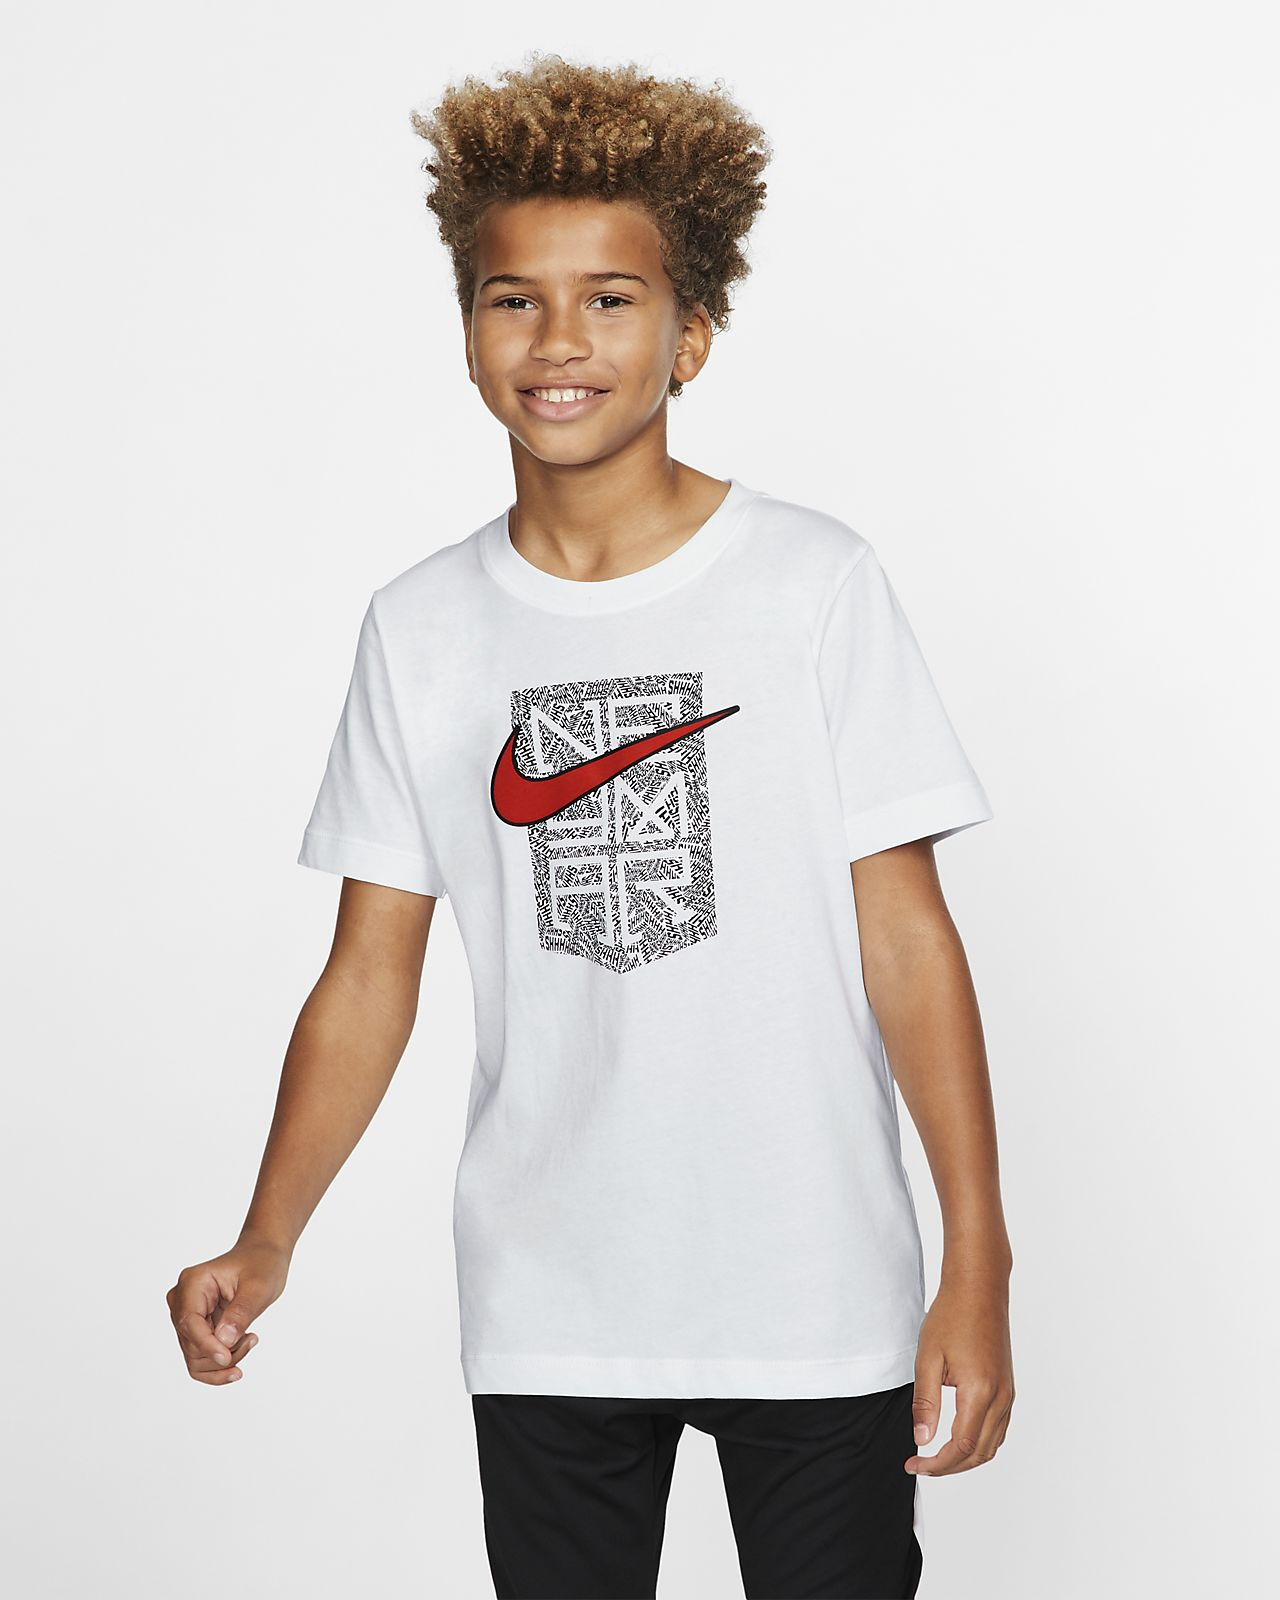 Playera para niños talla grande Neymar Jr.